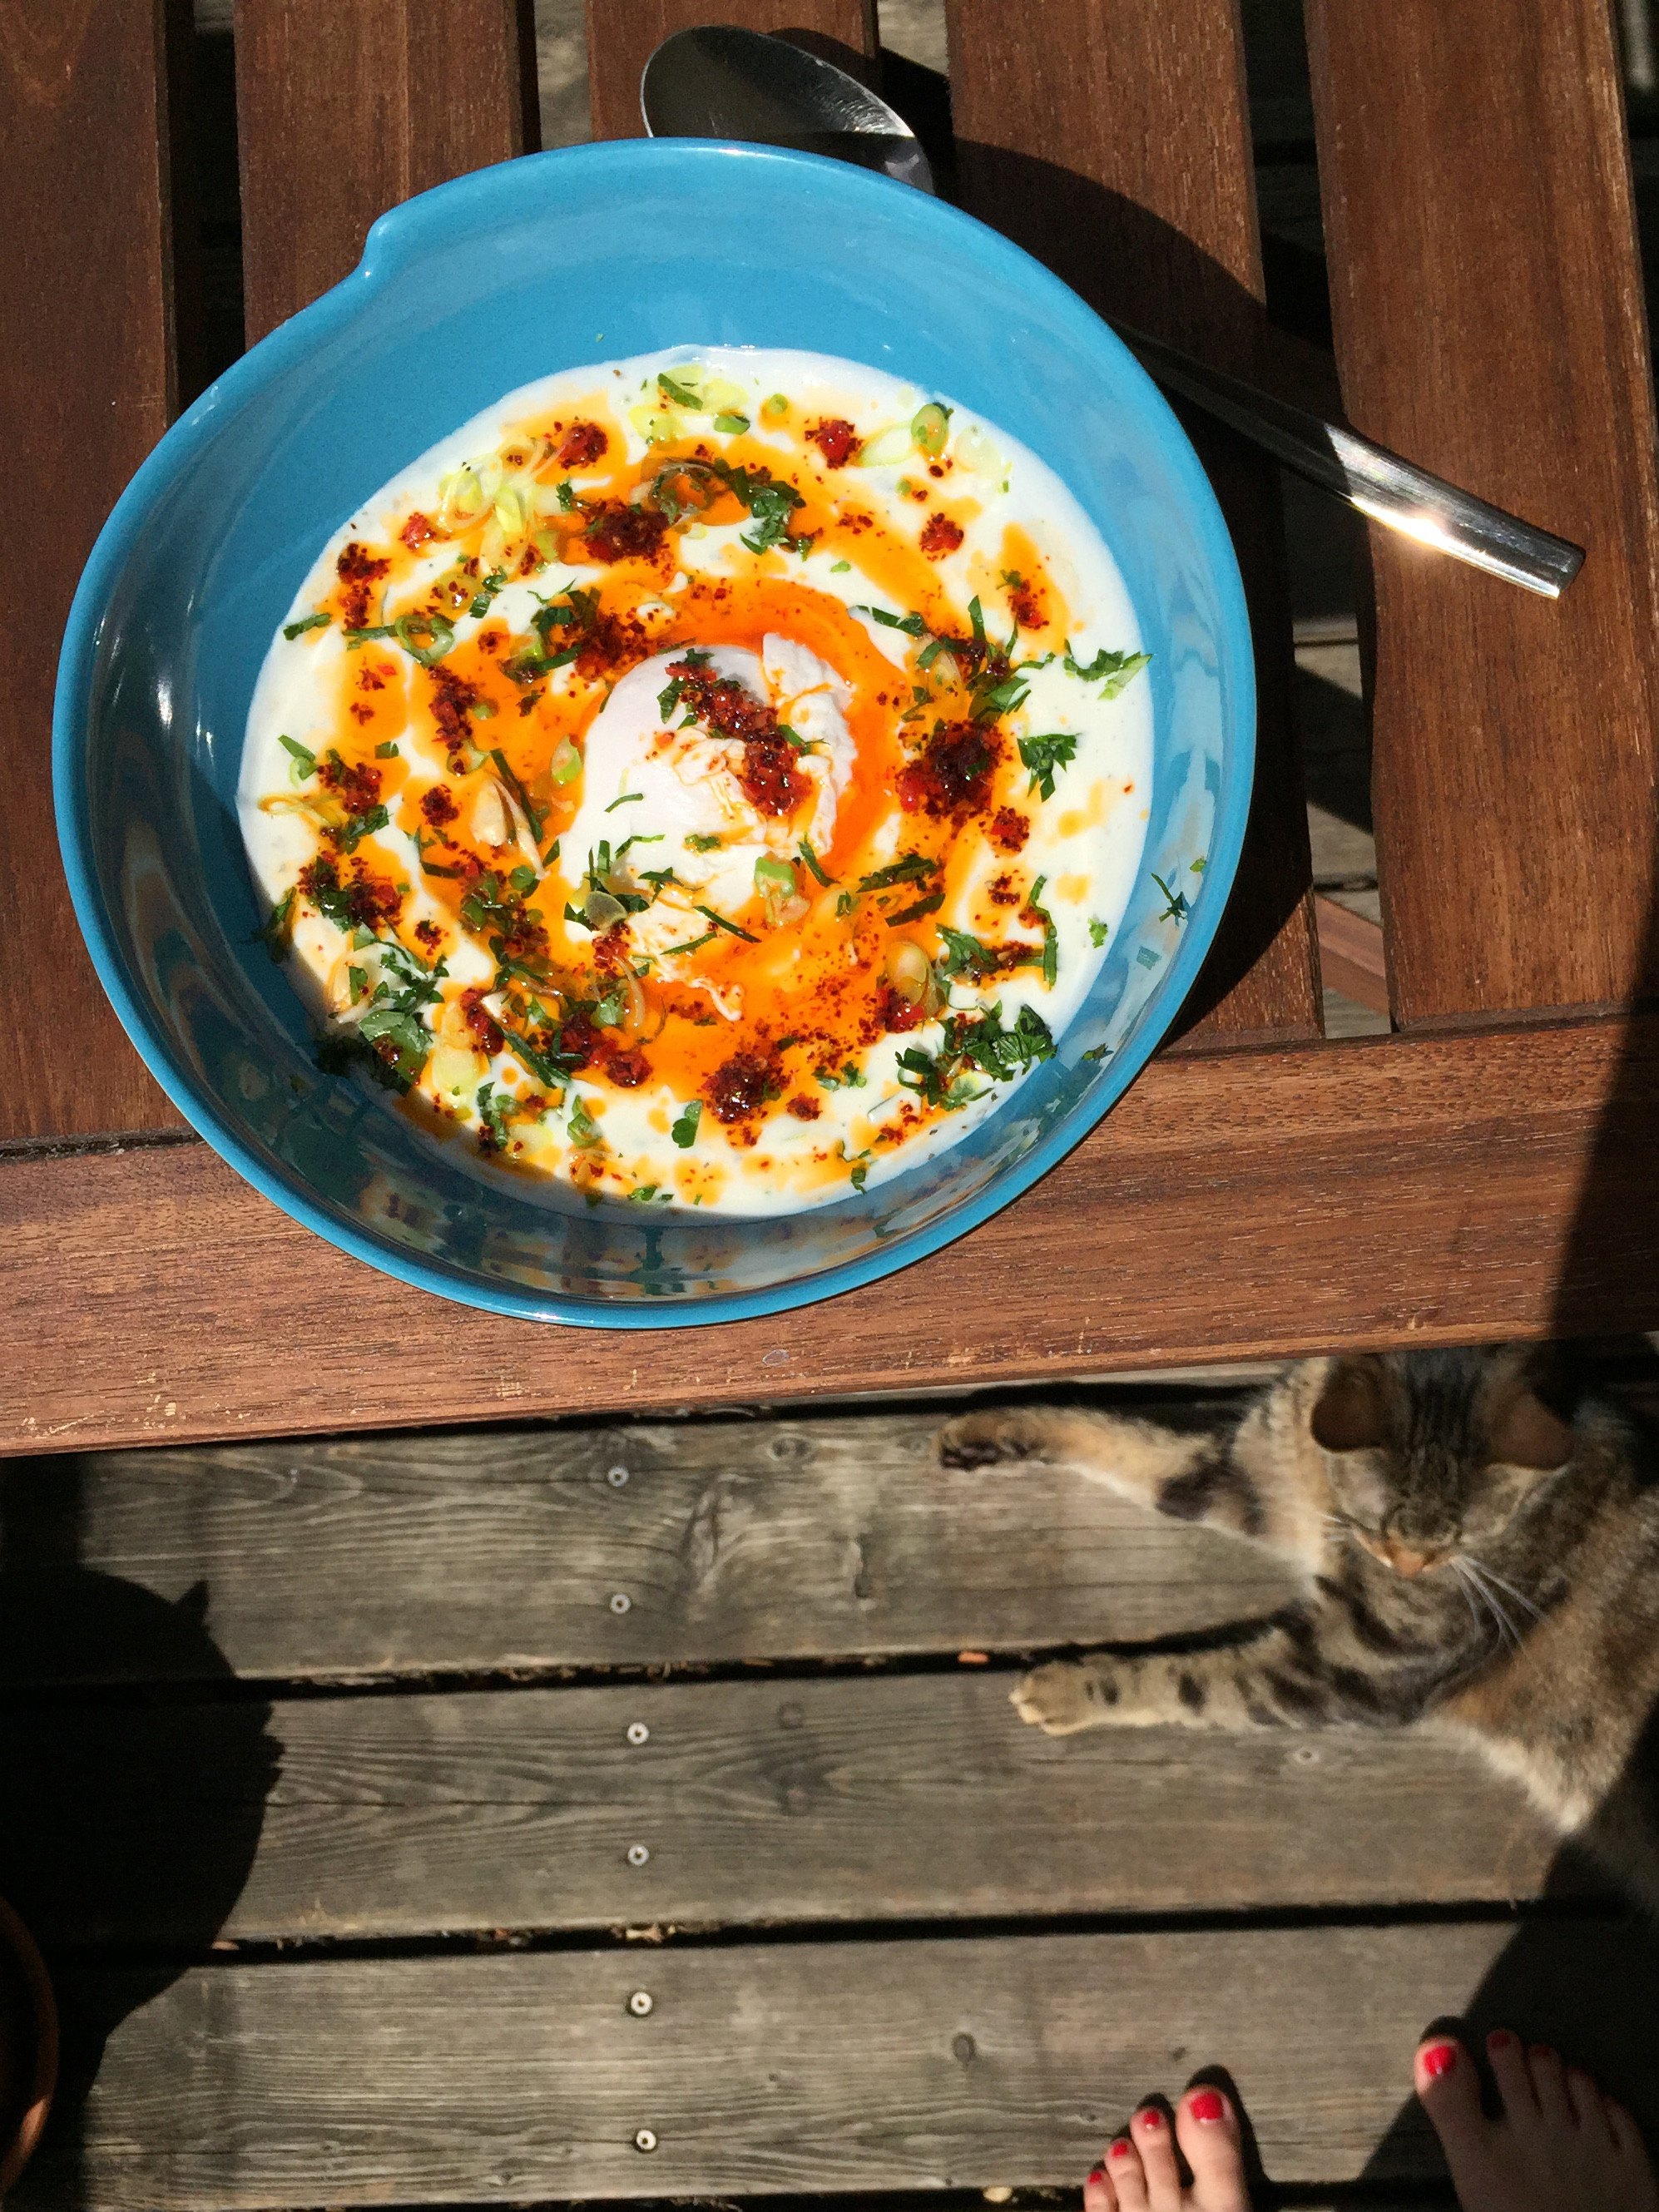 In Austria, Enjoying Cilbir, or Turkish Poached Eggs with Yogurt